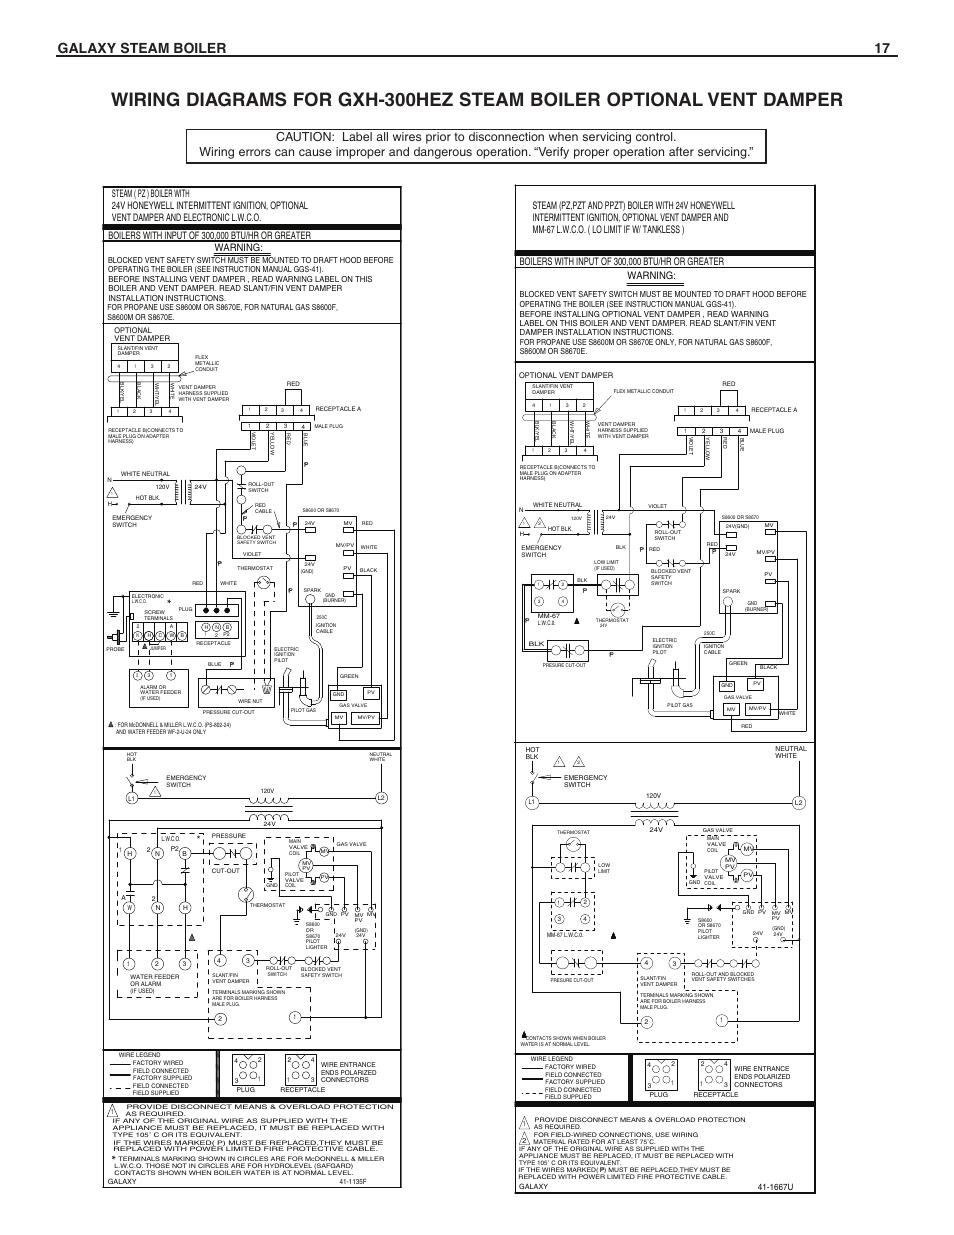 Galaxy steam boiler 17, Warning | Slant/Fin GXHA-200 User Manual | Page 17  / 20Manuals Directory